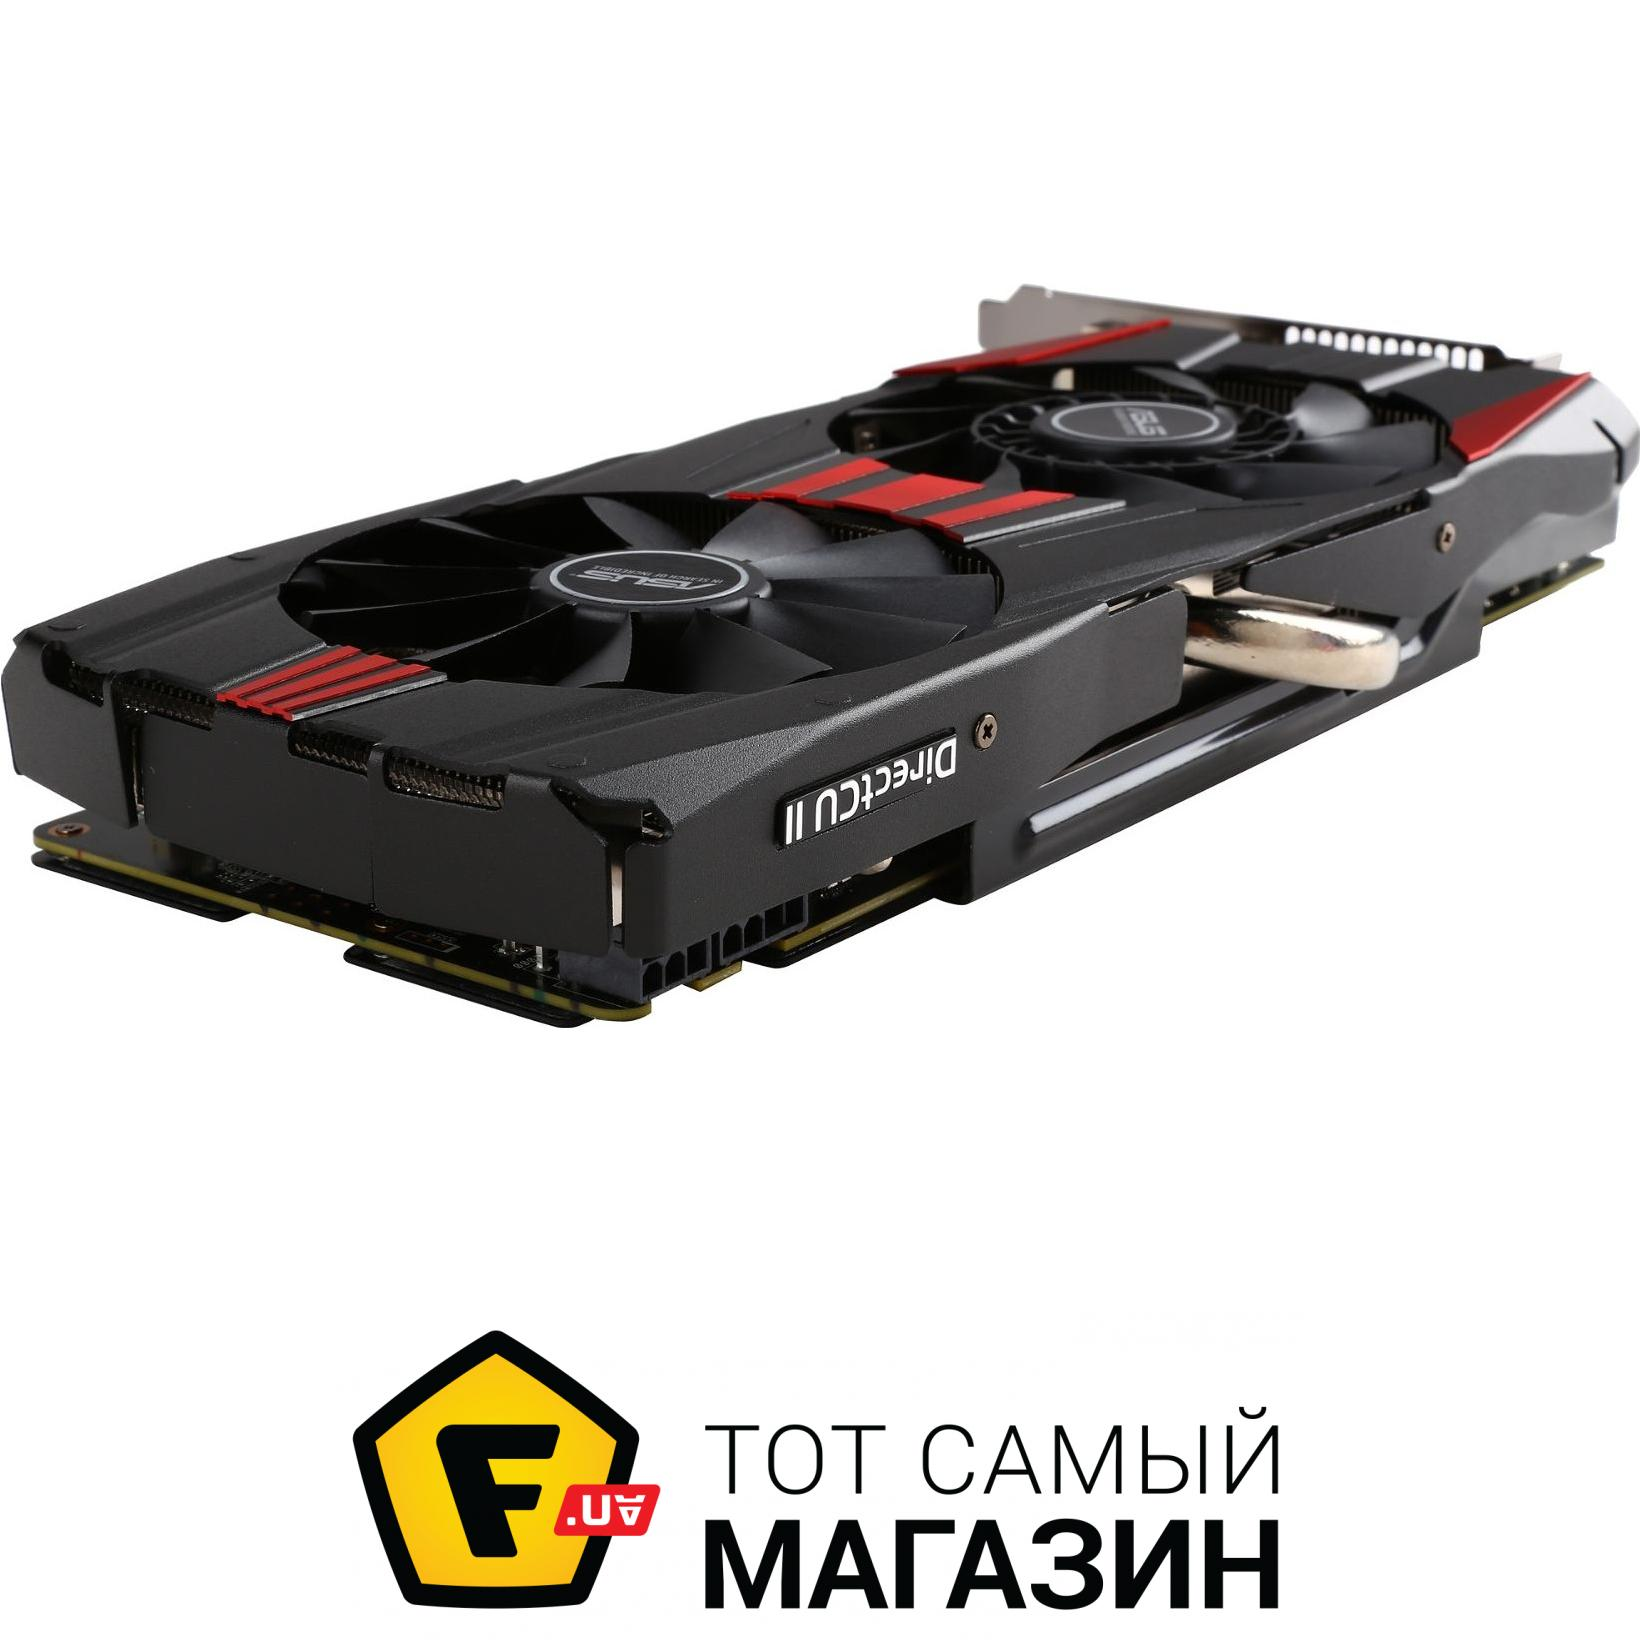 ASUS Radeon R9 390 8GB, 512bit, DDR5 (R9390-DC2-8GD5)